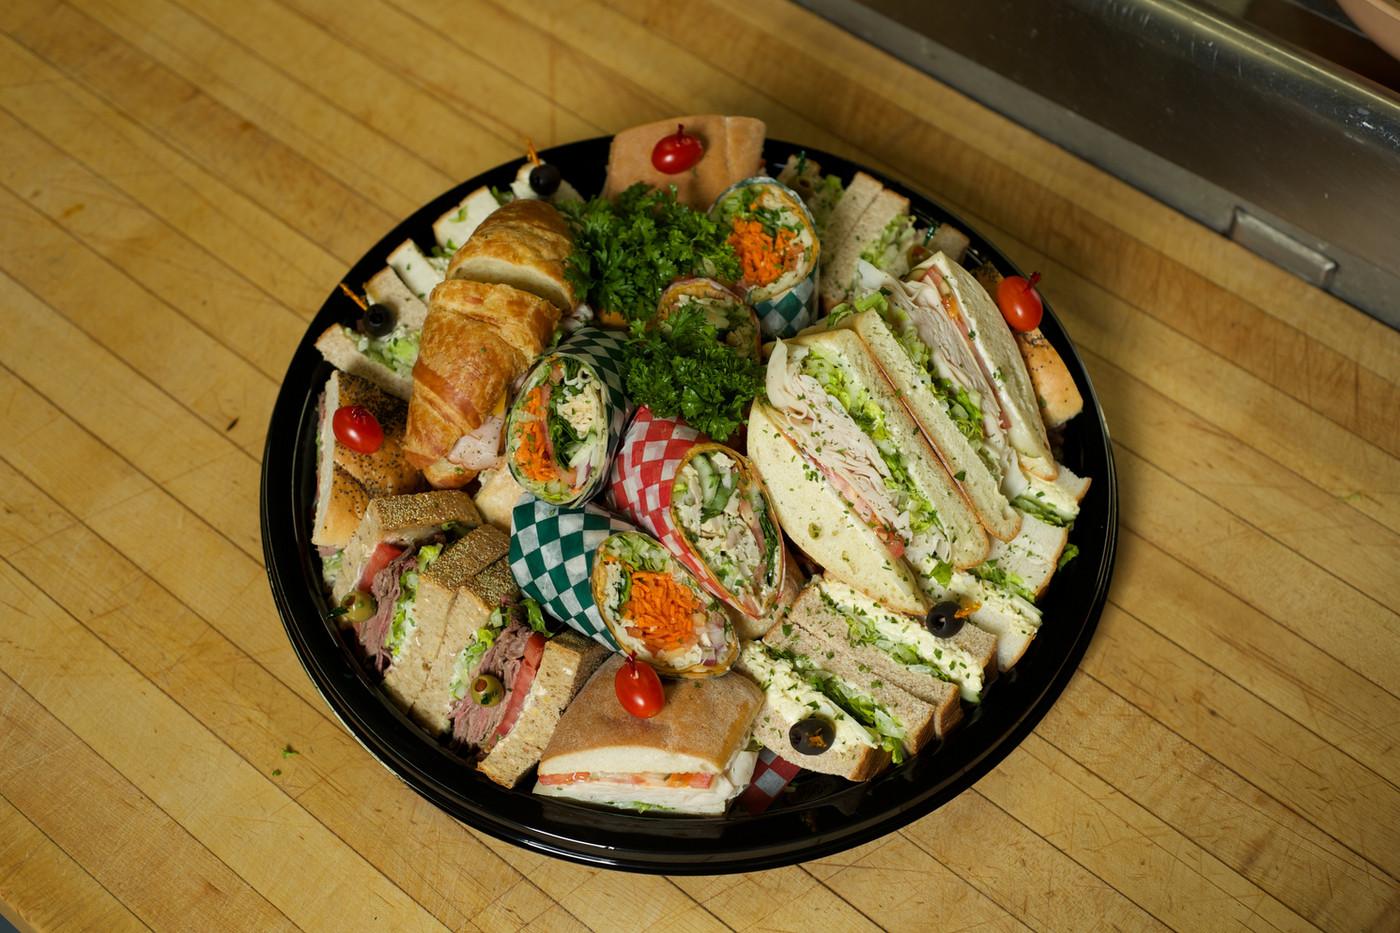 Assorted Sandwich Tray